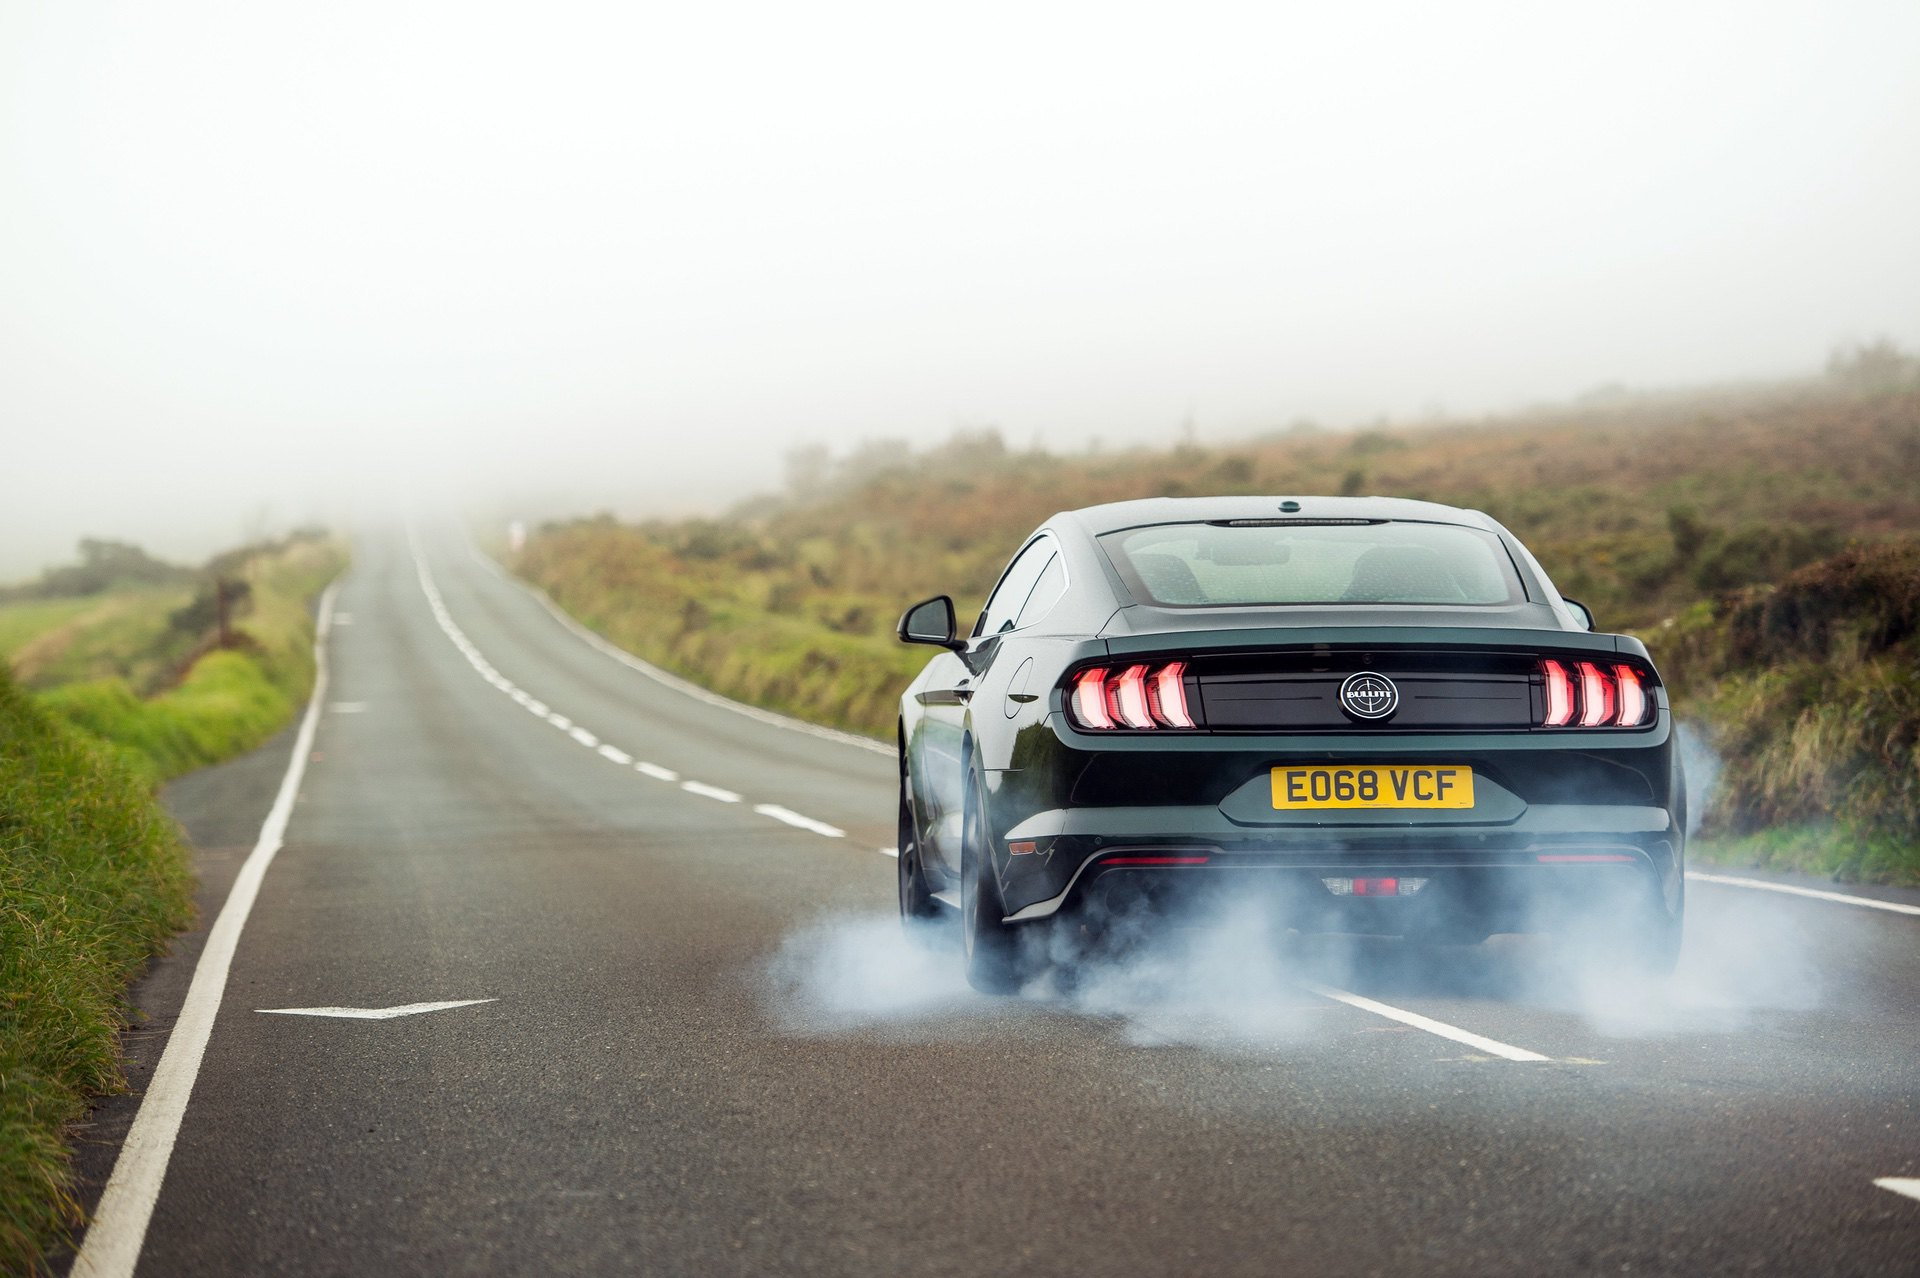 2019_Ford_Mustang_Bullitt_Isle_of_Mman0008